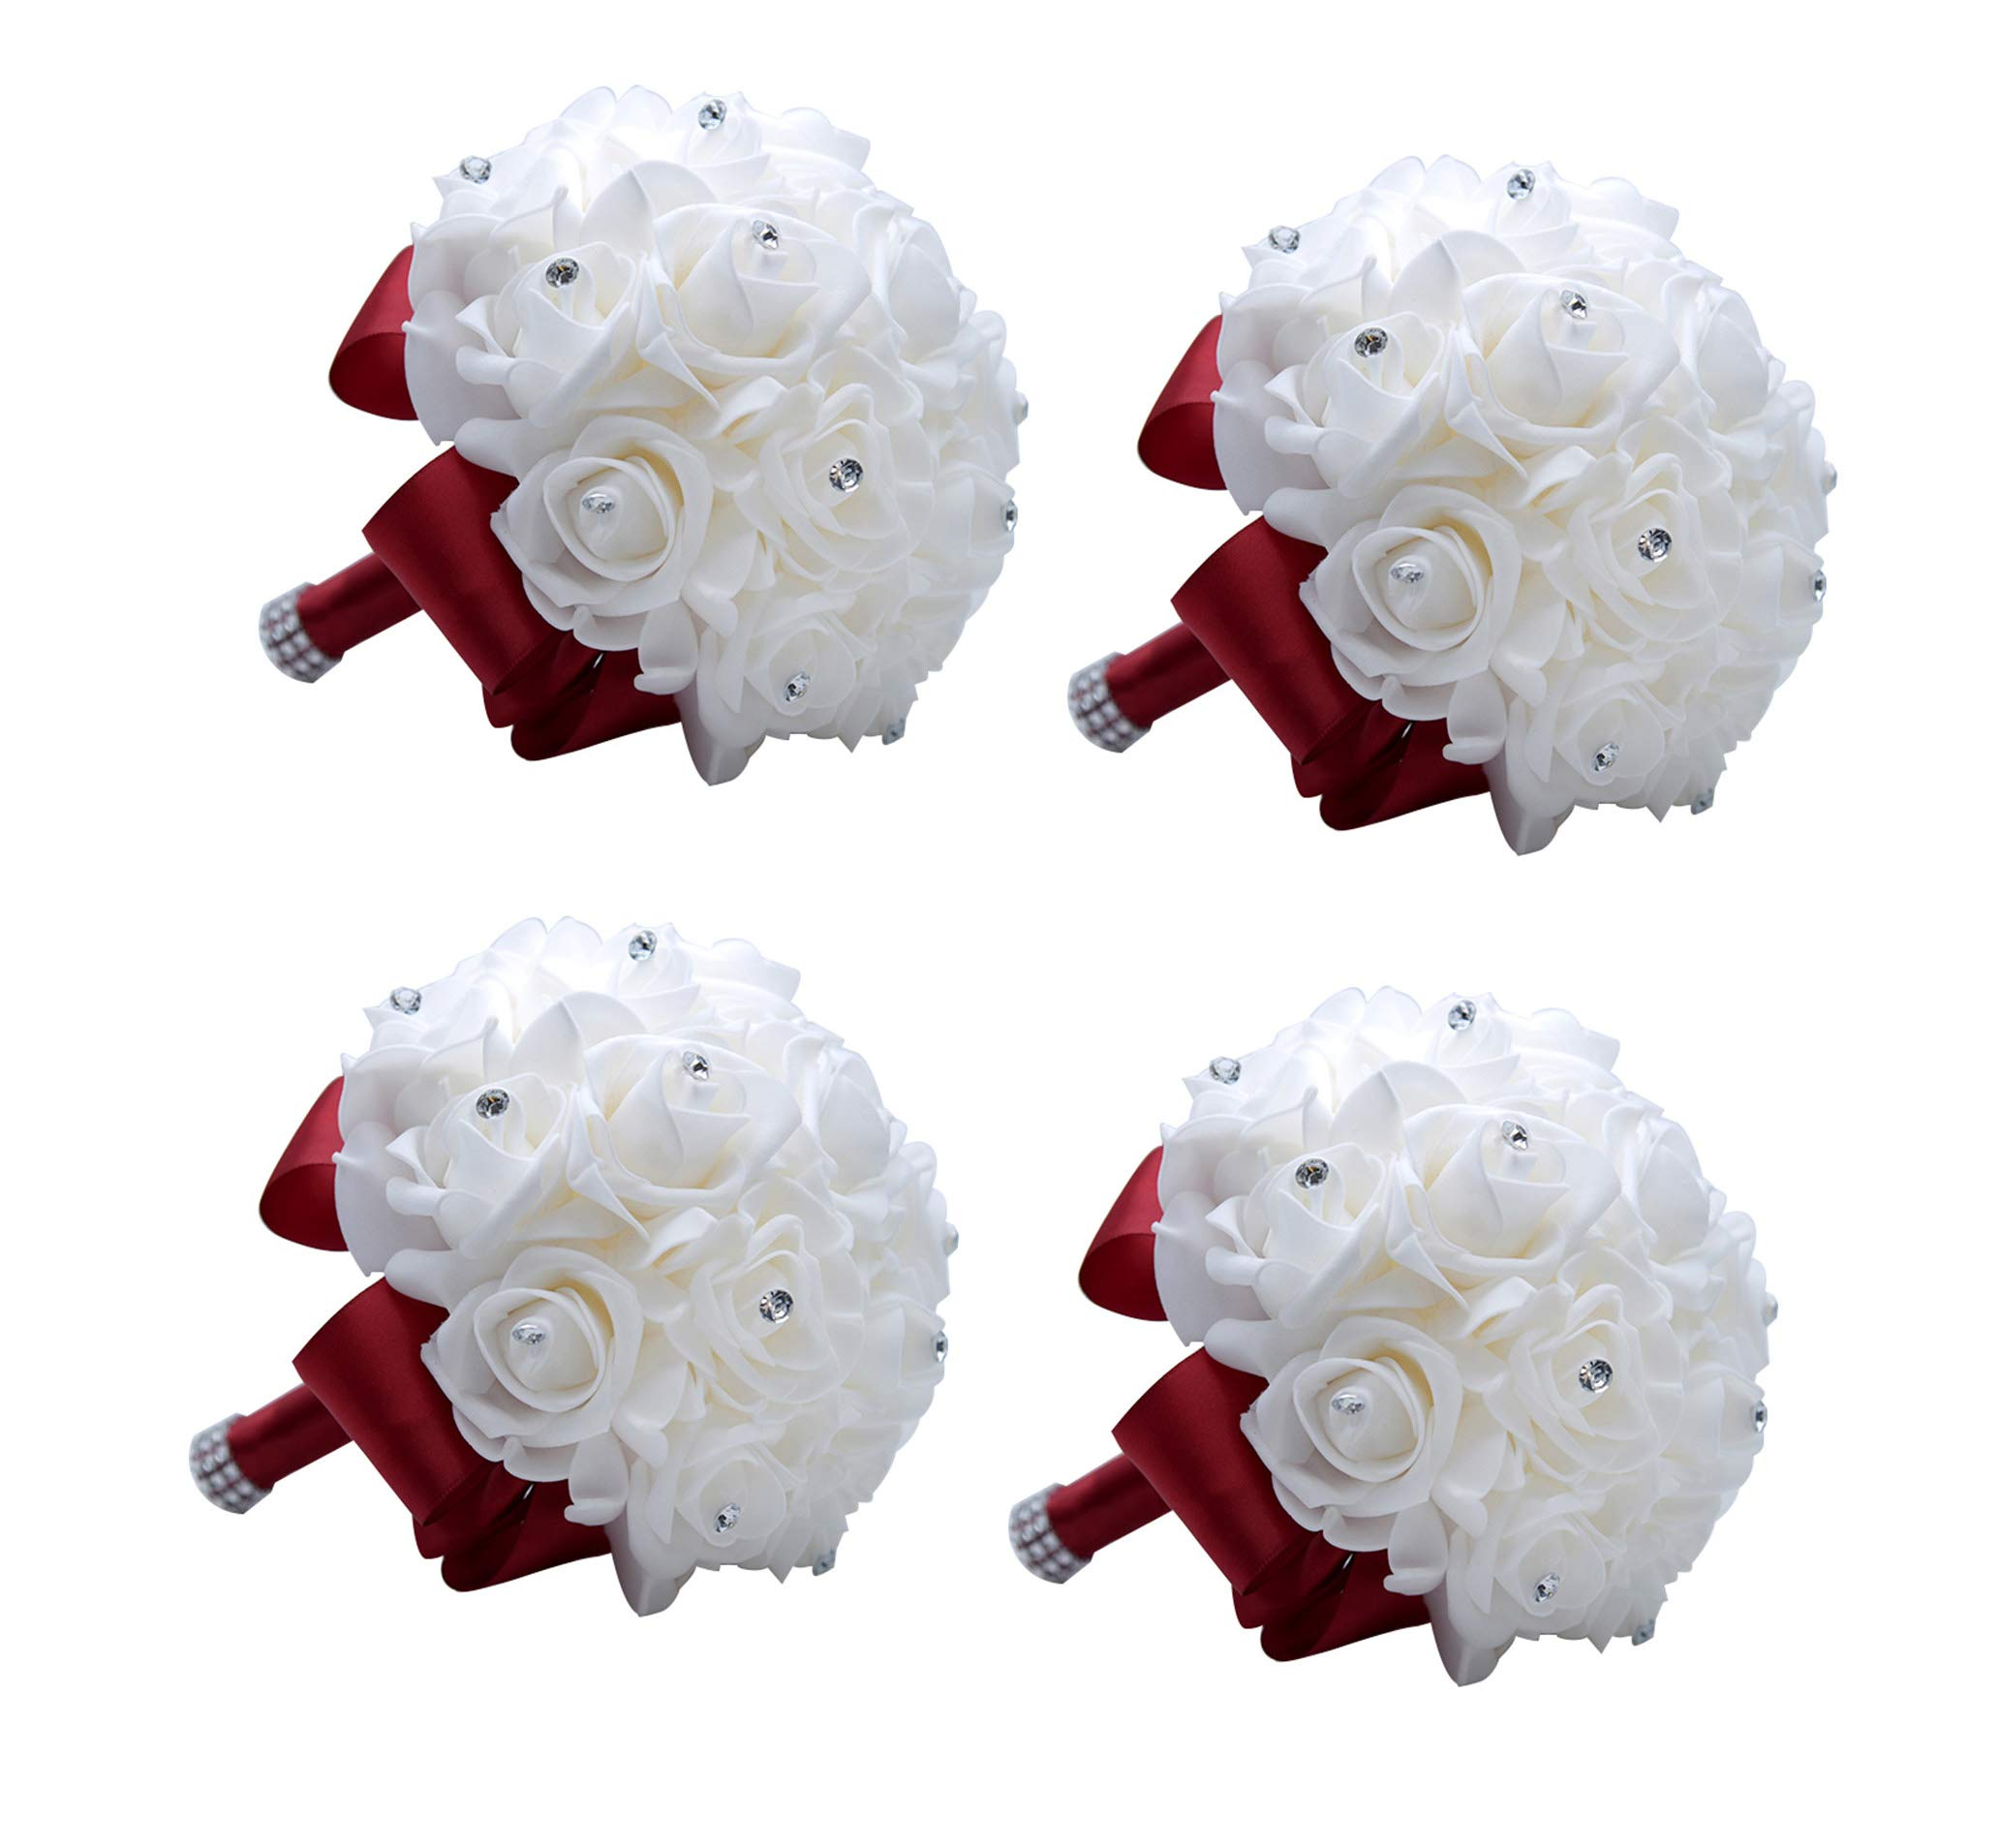 silk flower arrangements mojun wedding bouquets crystal pe roses bridal bridesmaid wedding hand holding bouquet artificial fake flowers toss bouquet, 4 pack burgundy